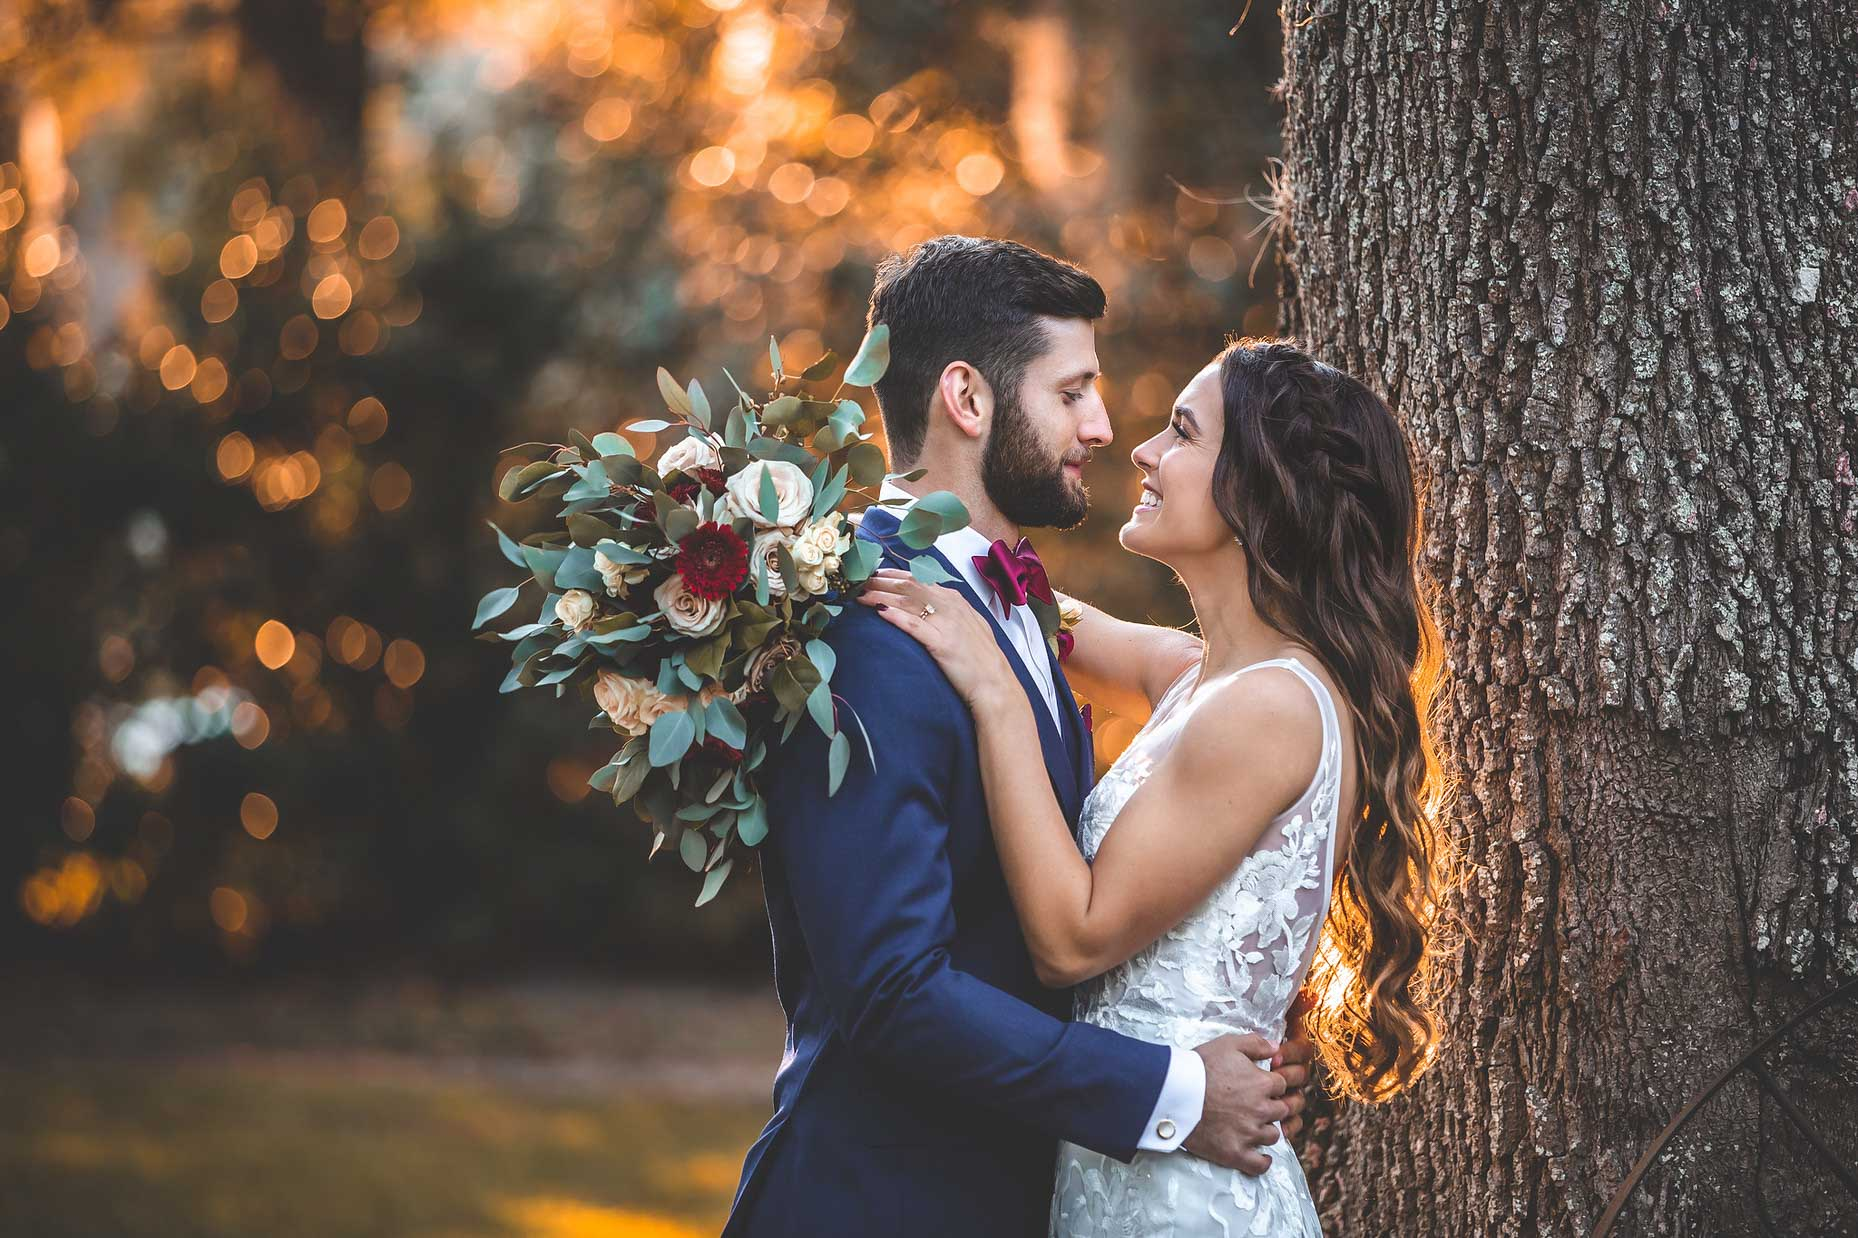 adam-szarmack-bowing-oaks-wedding-photographer-jacksonville-106.jpg